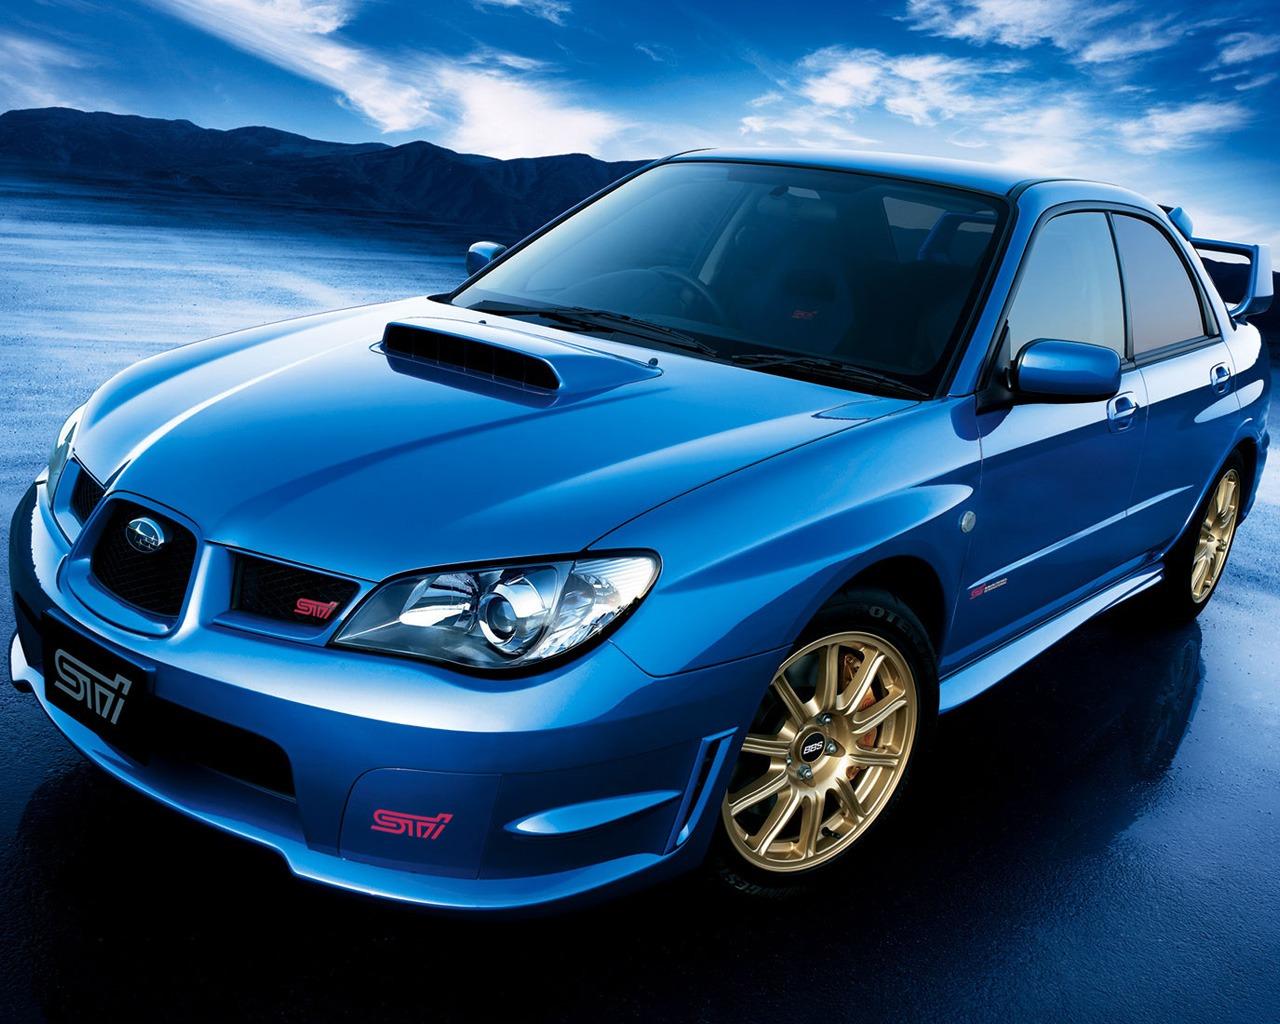 Subaru brz phone wallpaper